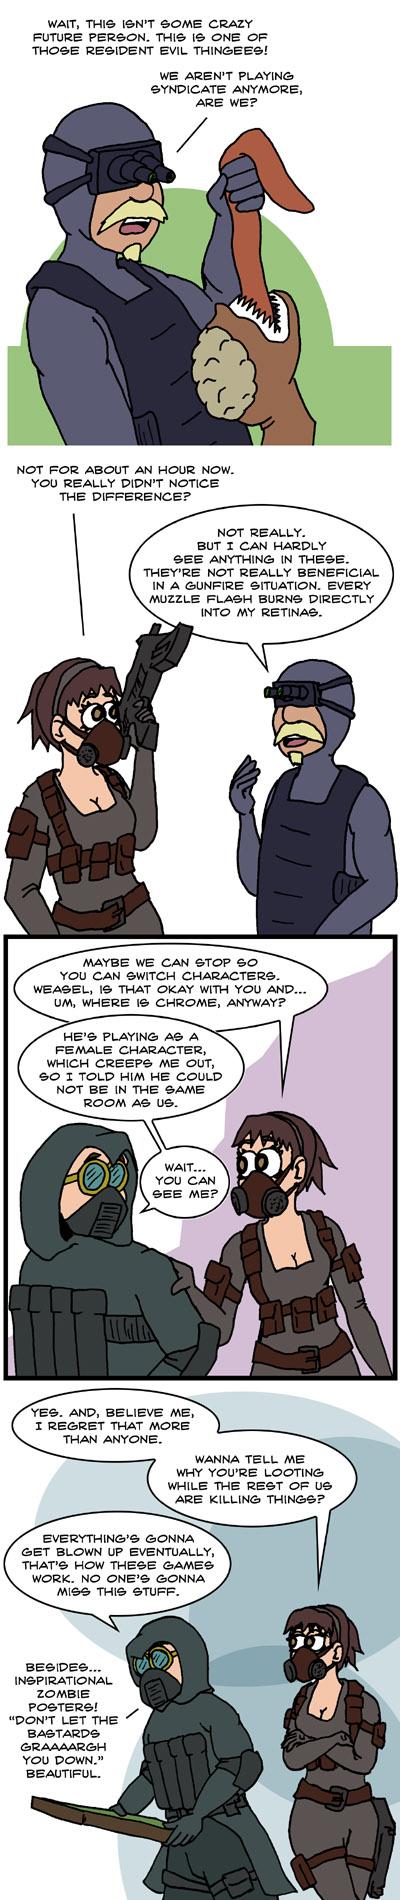 Resident Evil Operation Raccoon City - Teamwork Ethics